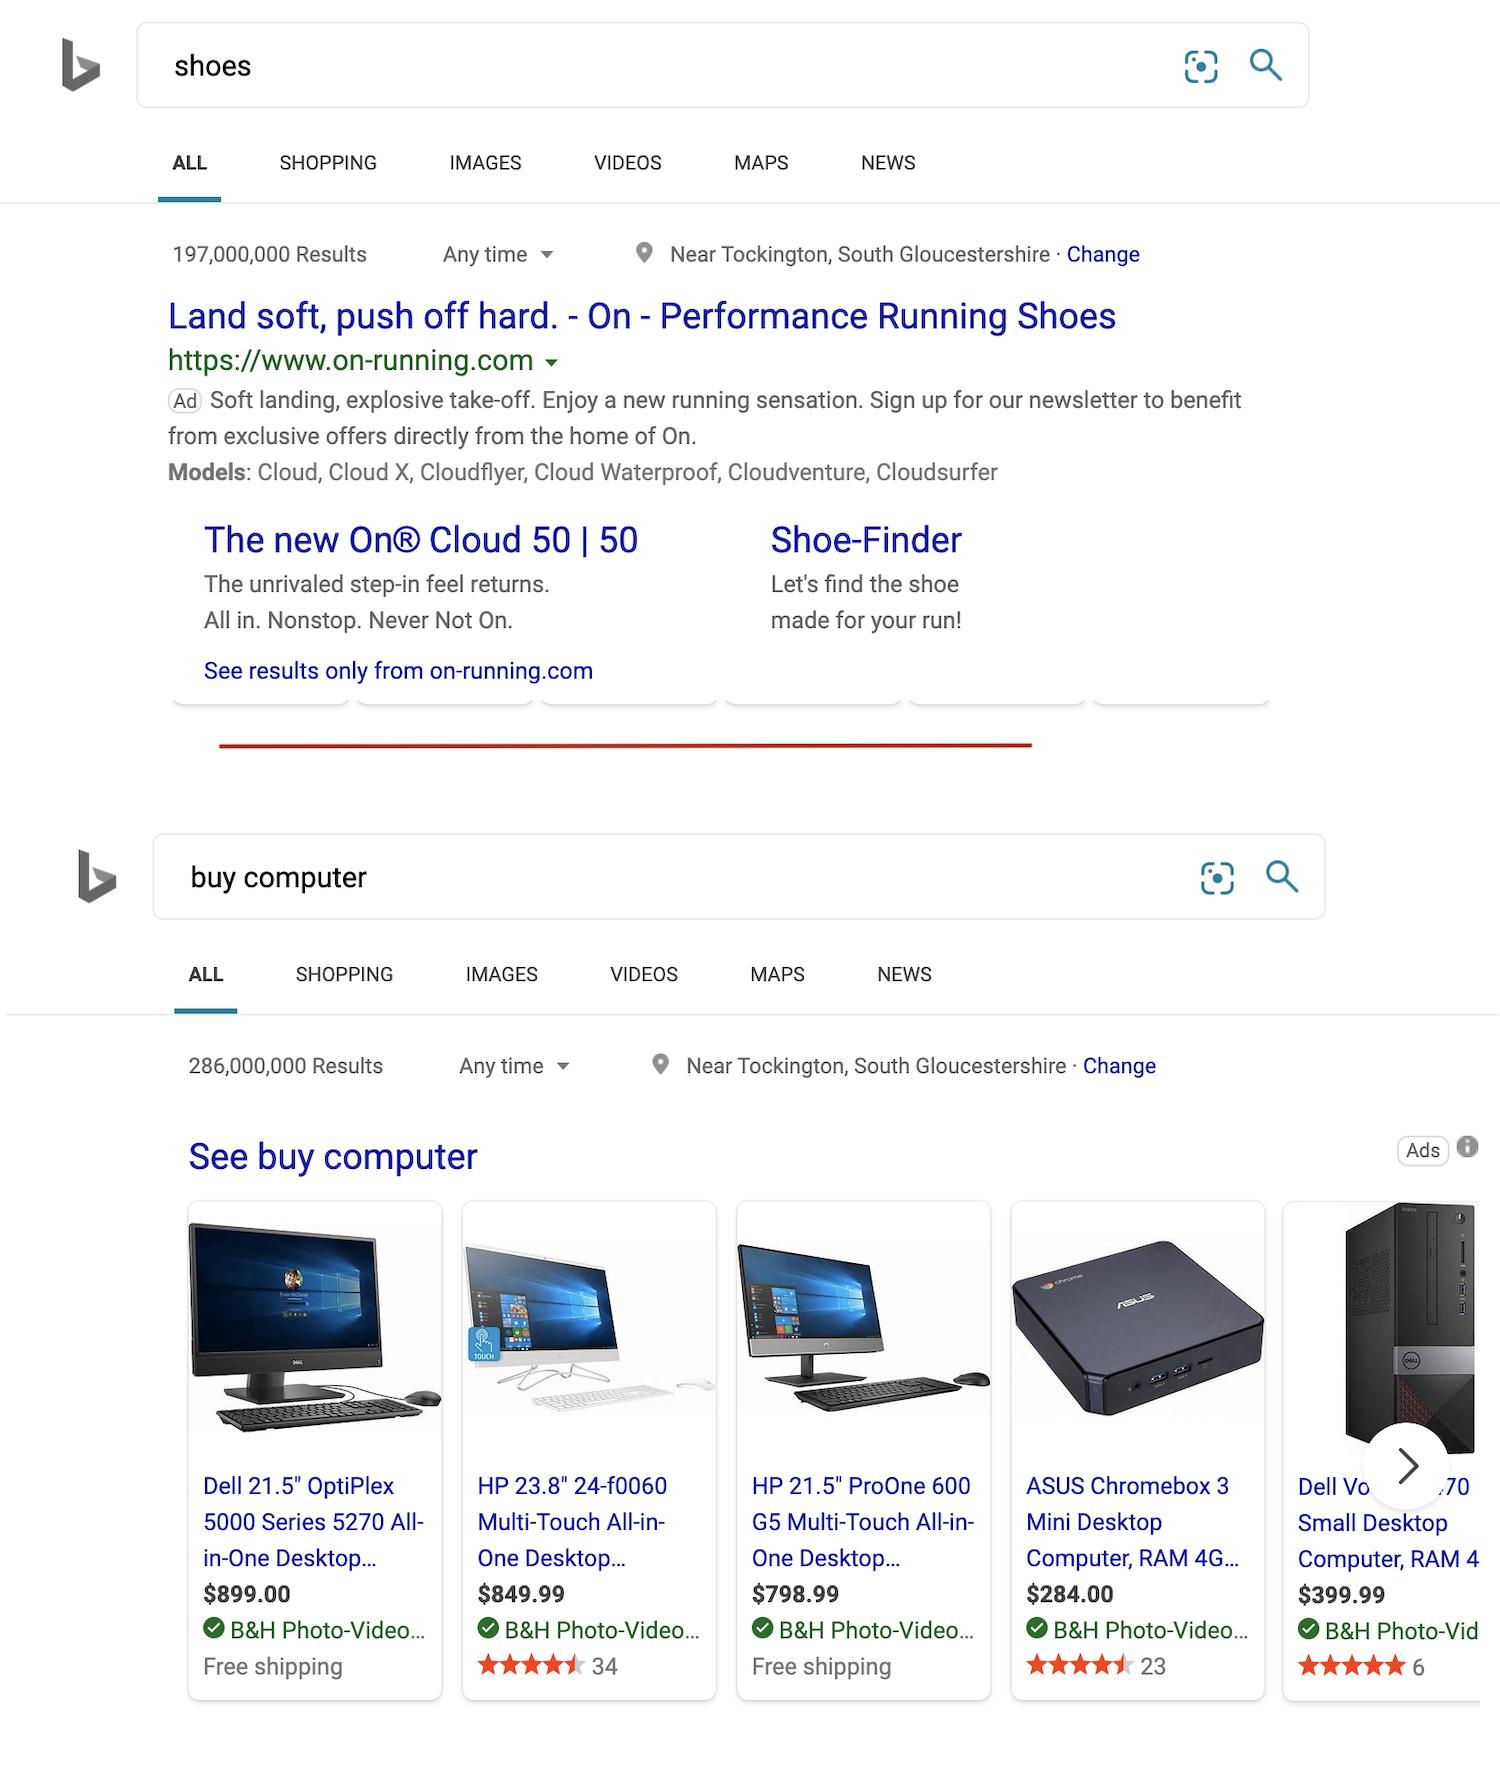 Ads on Bing SERP